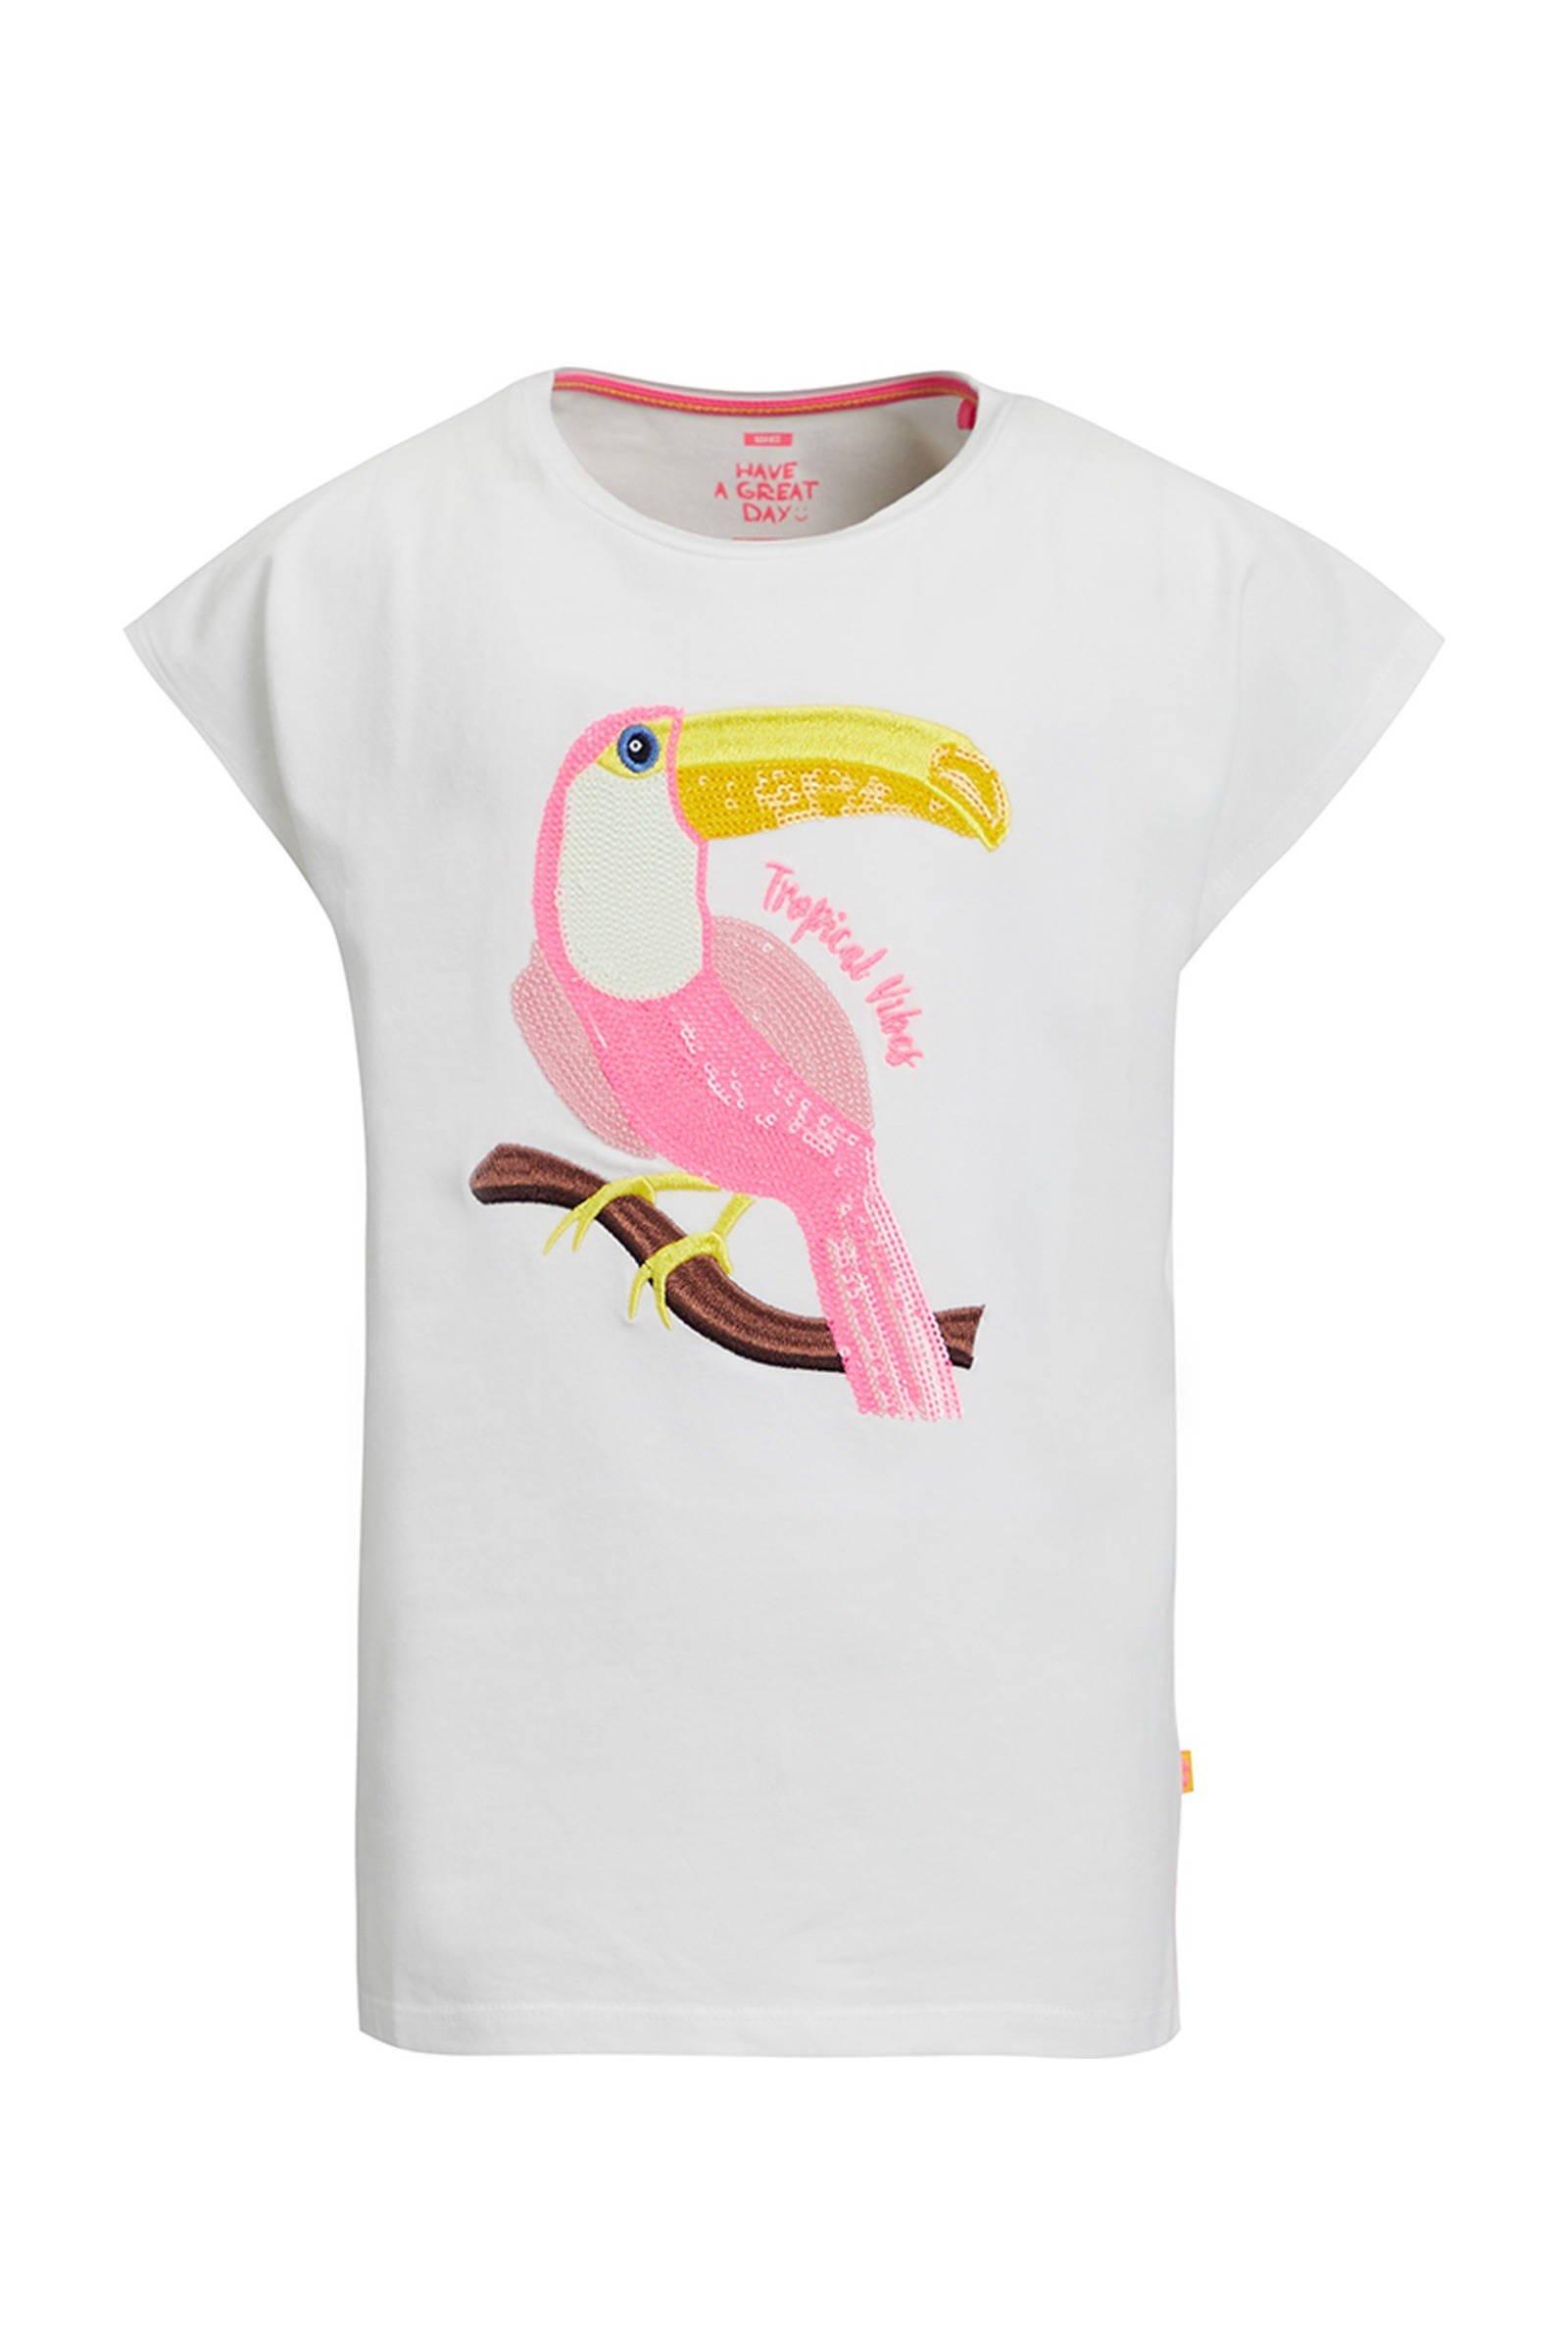 WE Fashion T-shirt met printopdruk en pailletten wit - maat 122/128